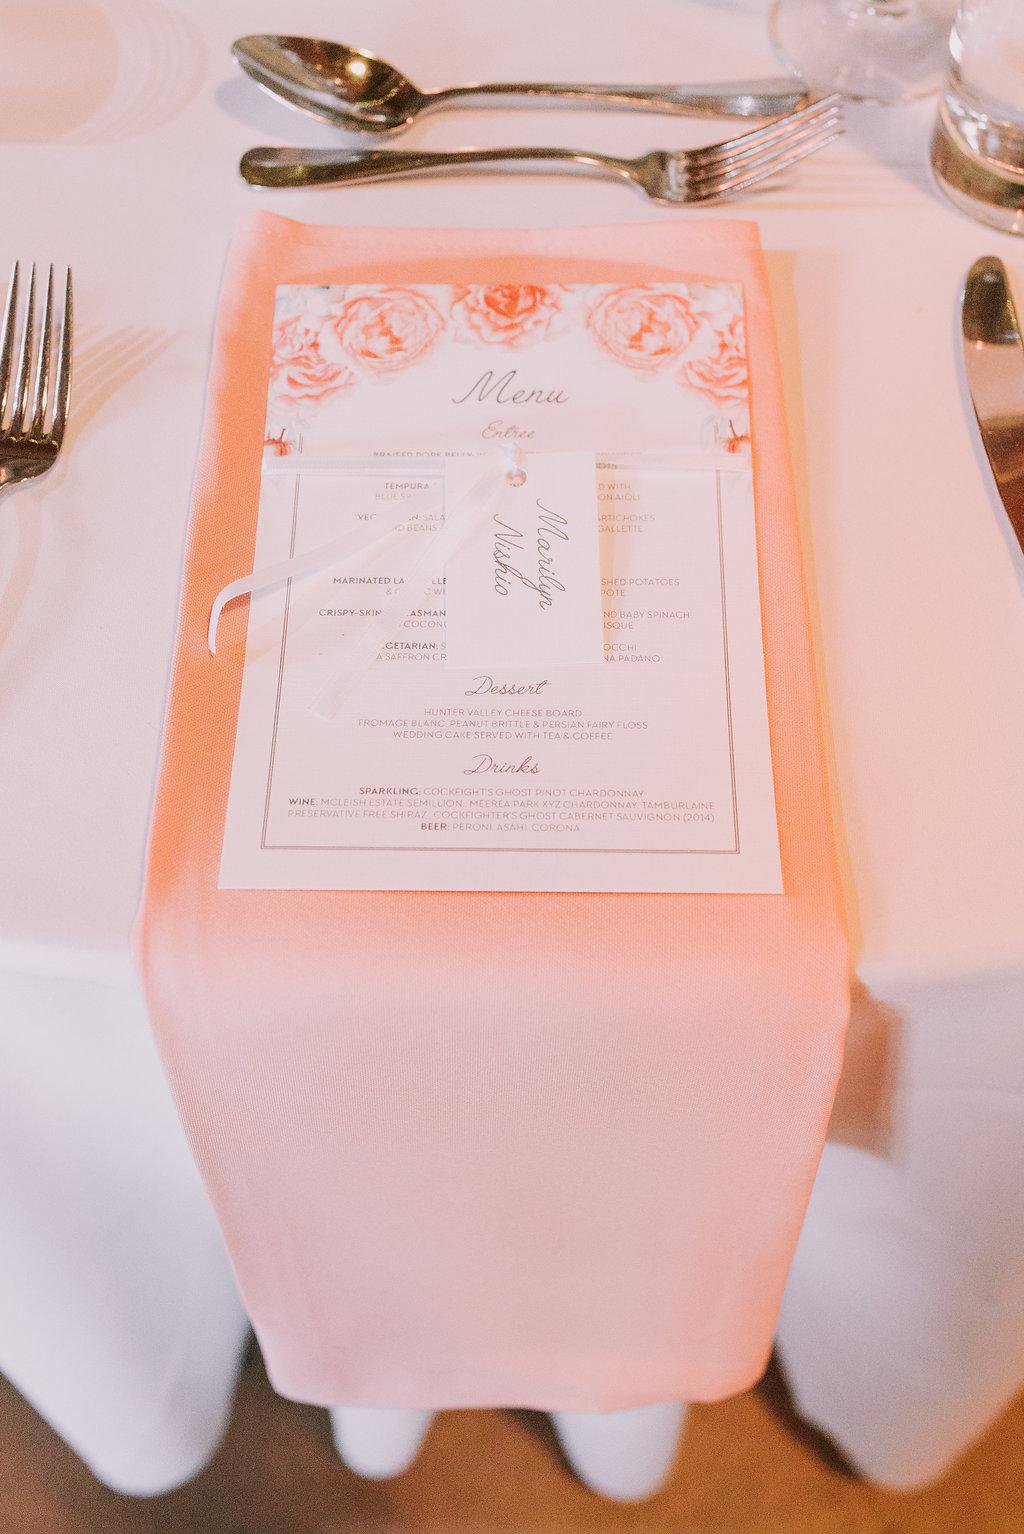 Printed Wedding Menu & Tabletop Hire Napkins - Wedding Styling & Invitations Hunter Valley